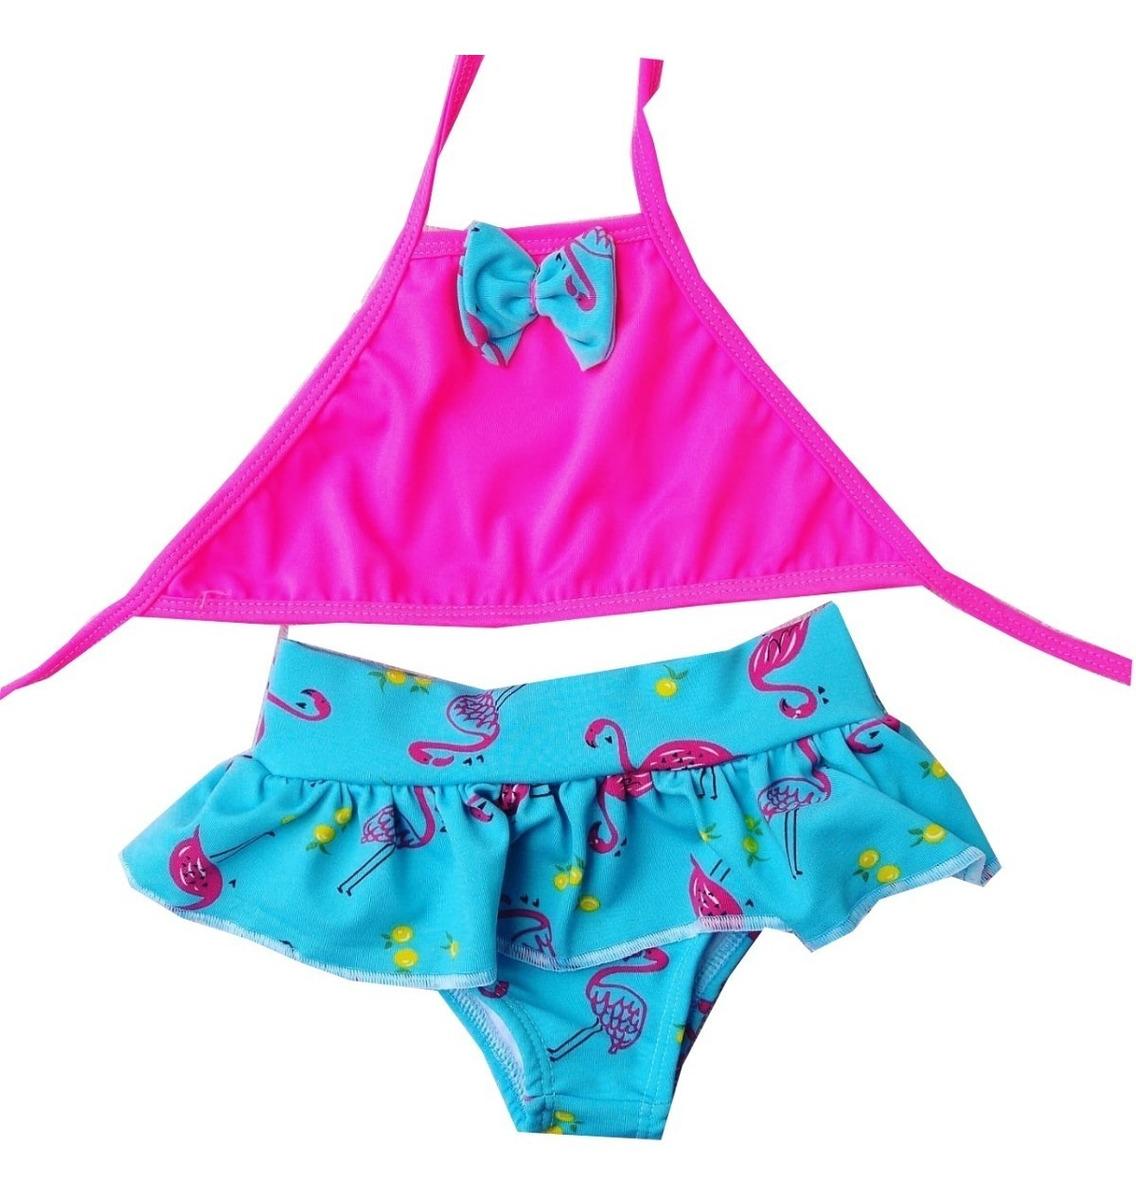 4924577d69e9 Biquini Bikini Retro Infantil Bebe Ref: 52617 - R$ 39,90 em Mercado ...